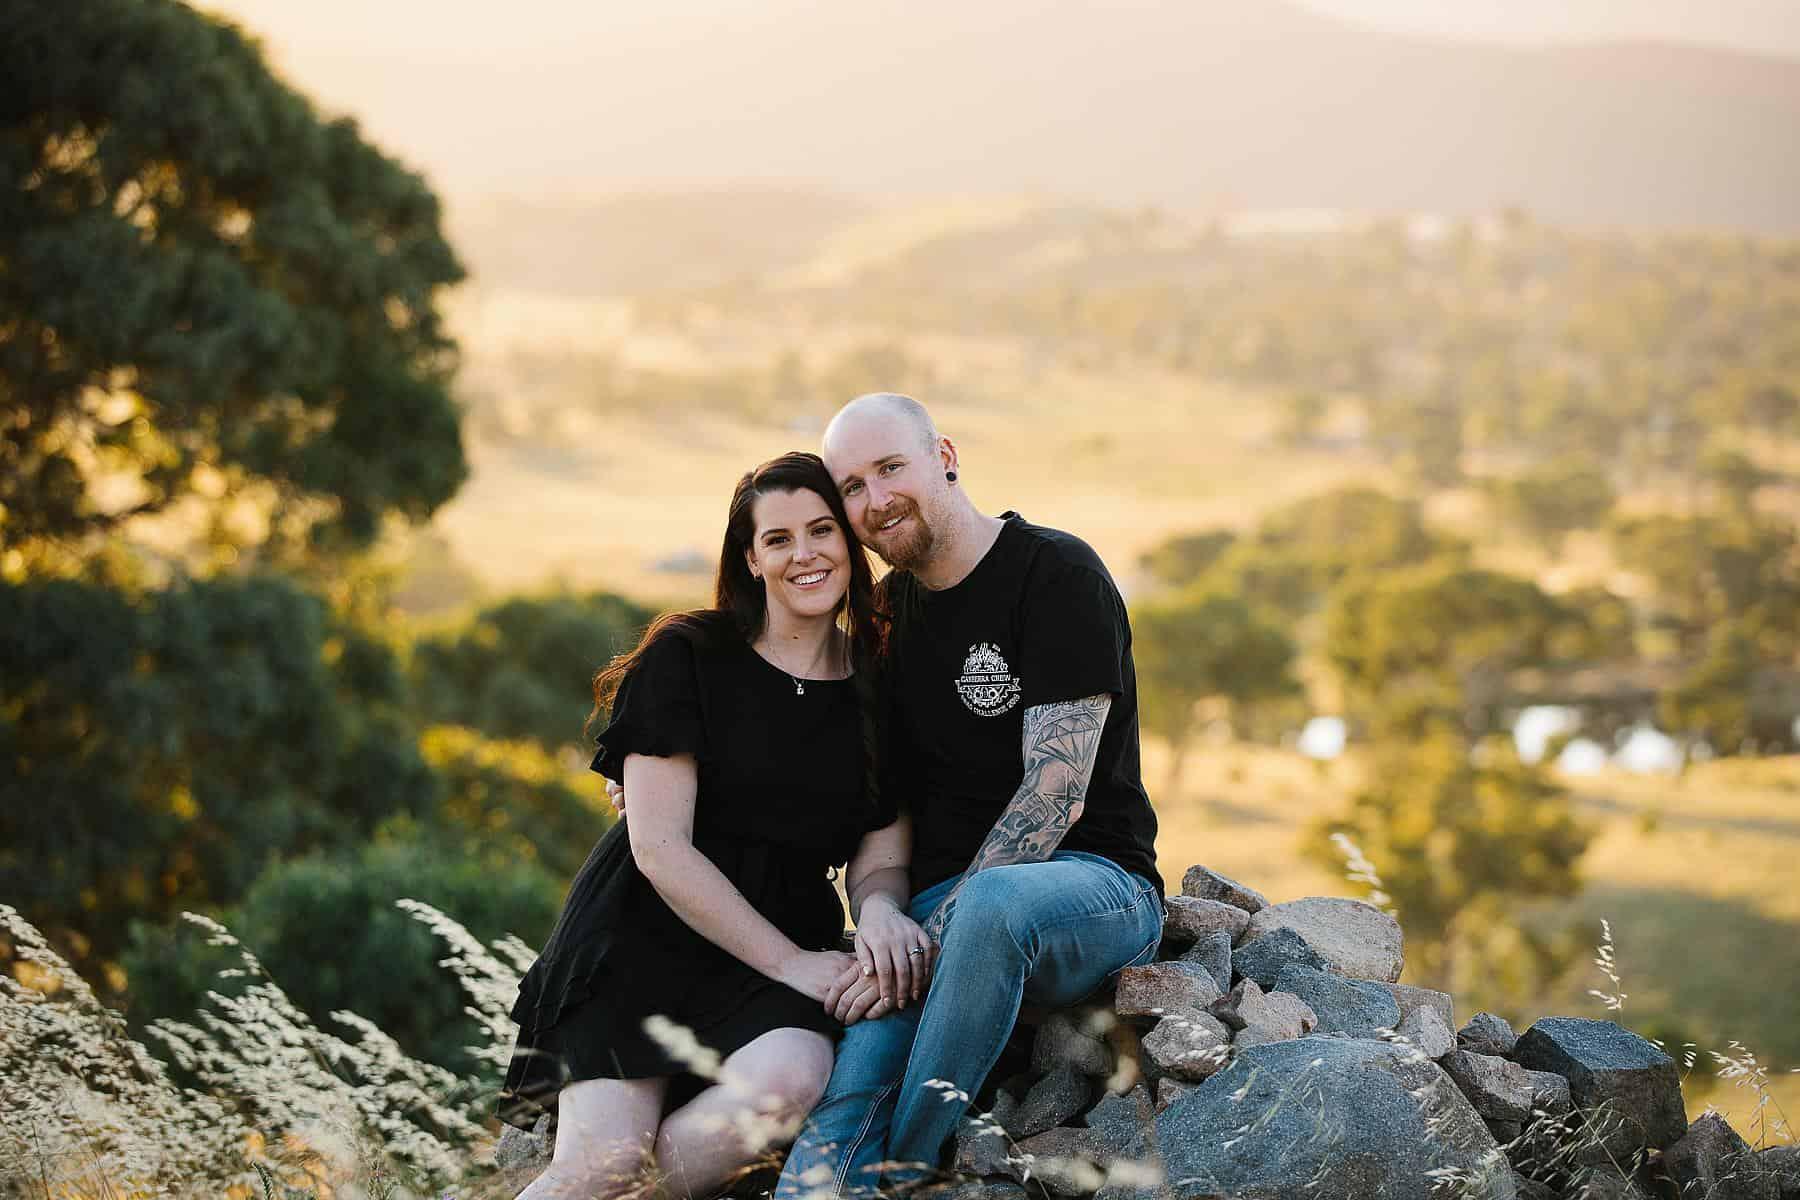 Sarah & Glenn Engagement, Canberra